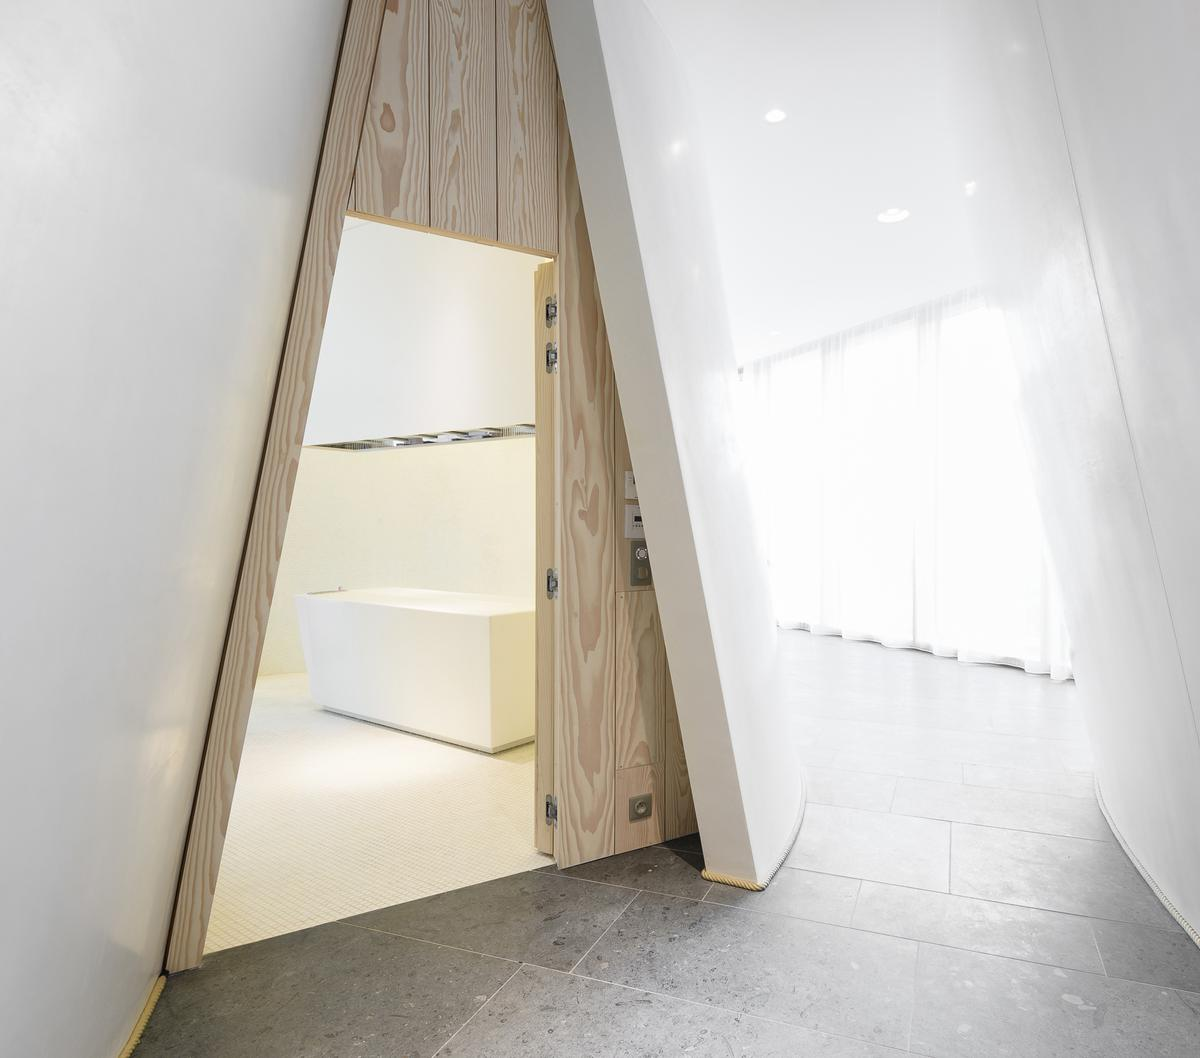 Alaena Spa features Japanese-inspired design / Alaena Spa